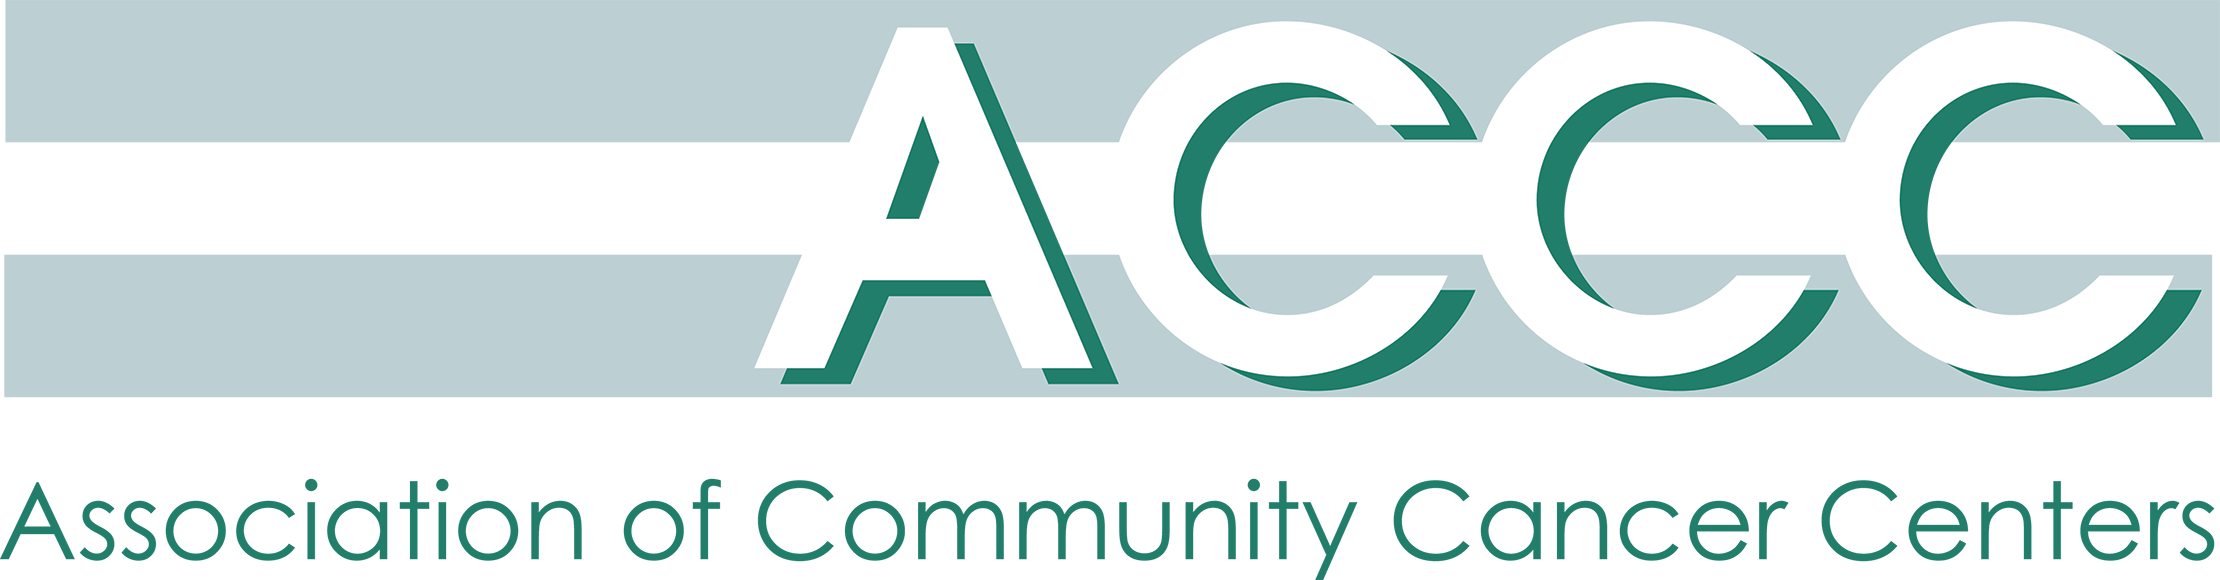 Sap Partners | Associations | <b>Association of Community Cancer Centers</b>